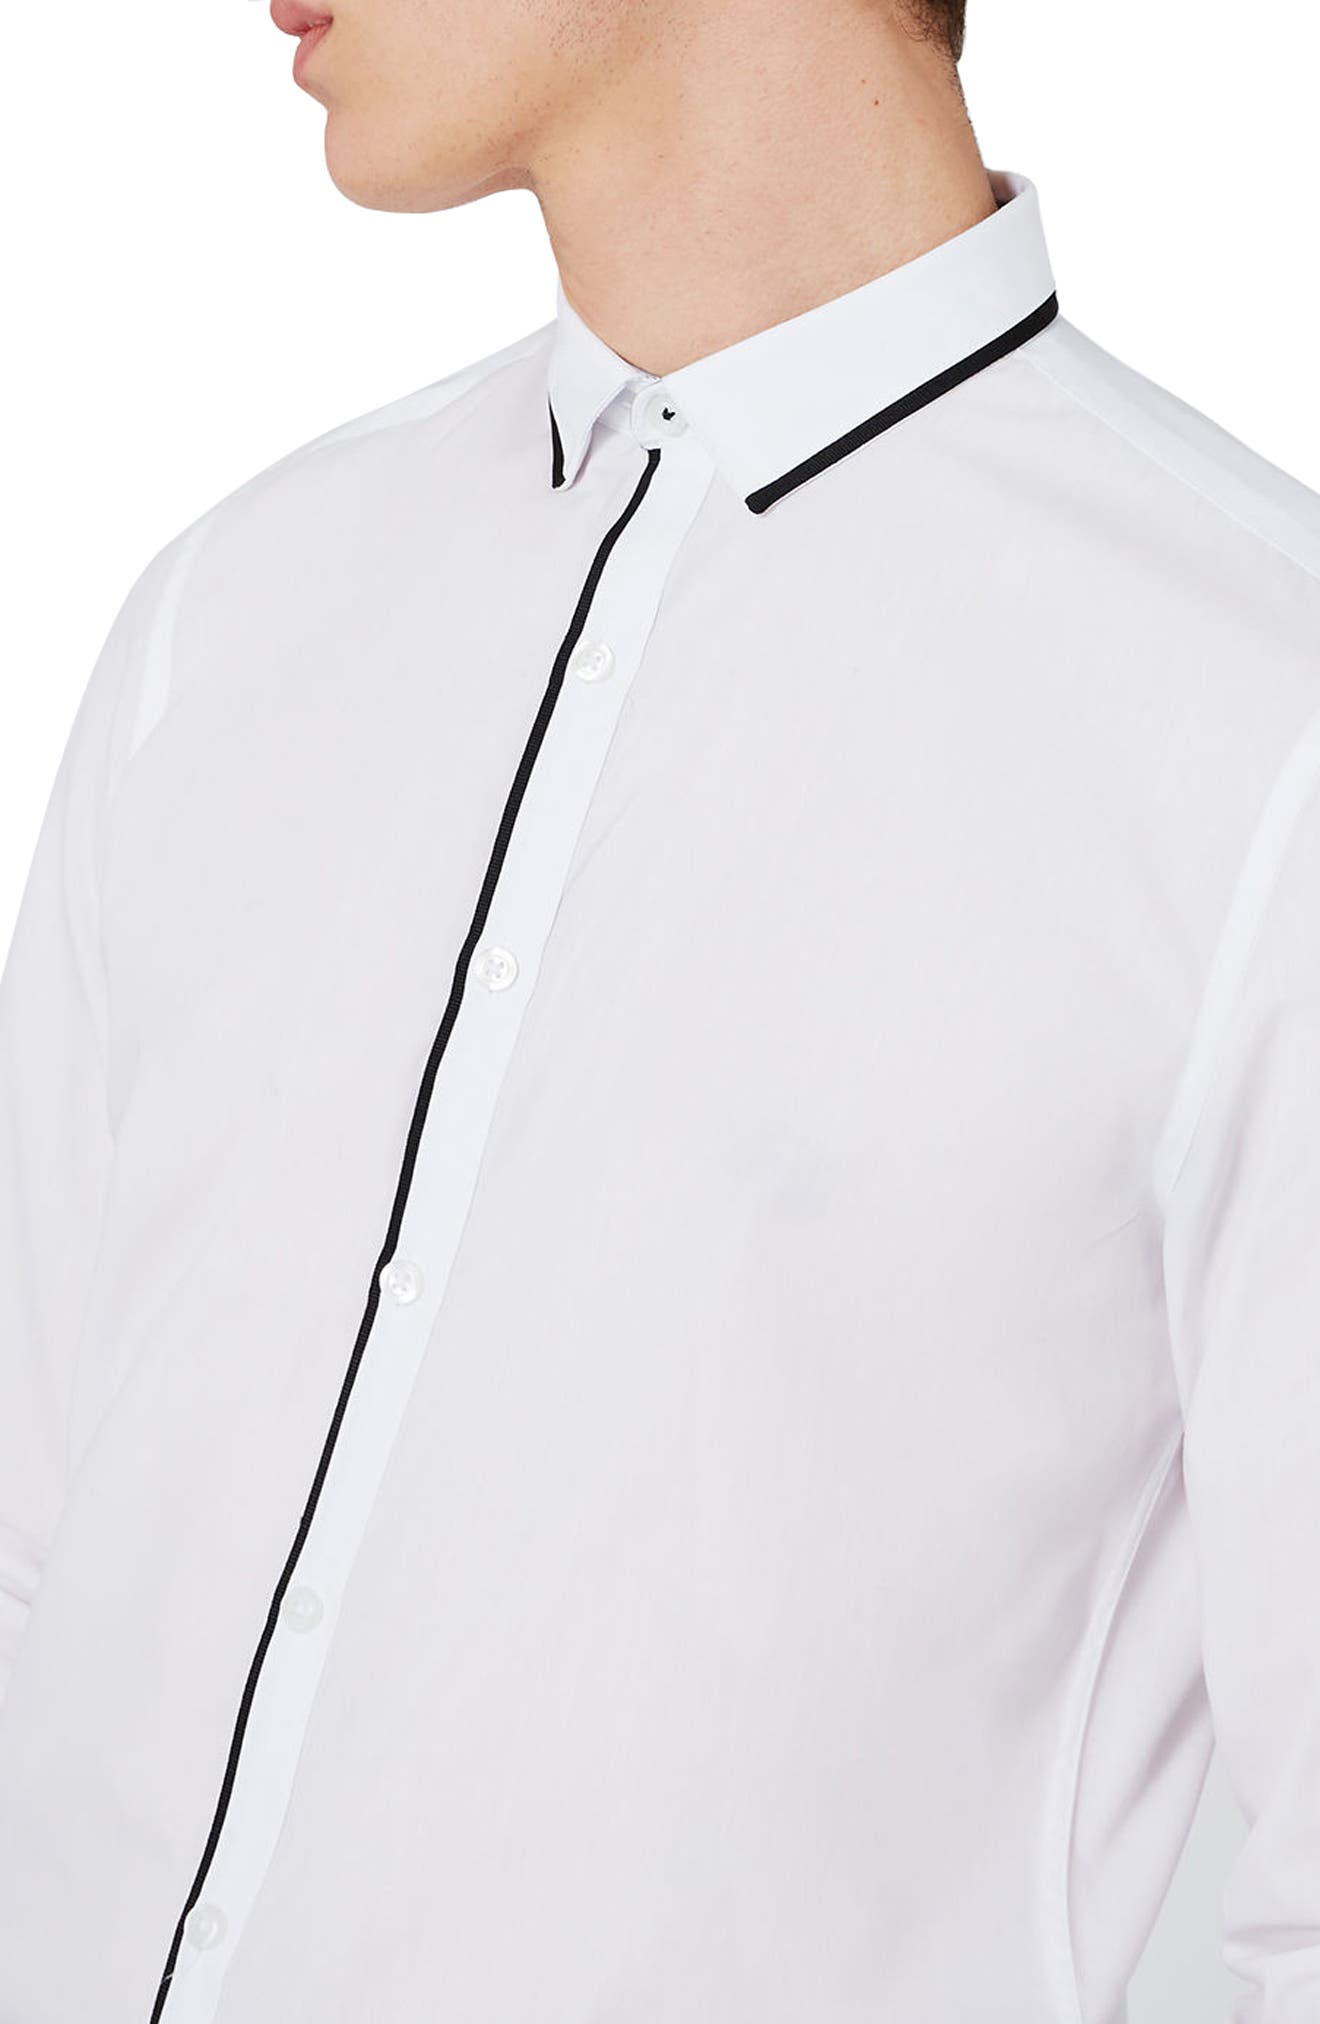 Alternate Image 5  - Topman Slim Fit Contrast Dress Shirt